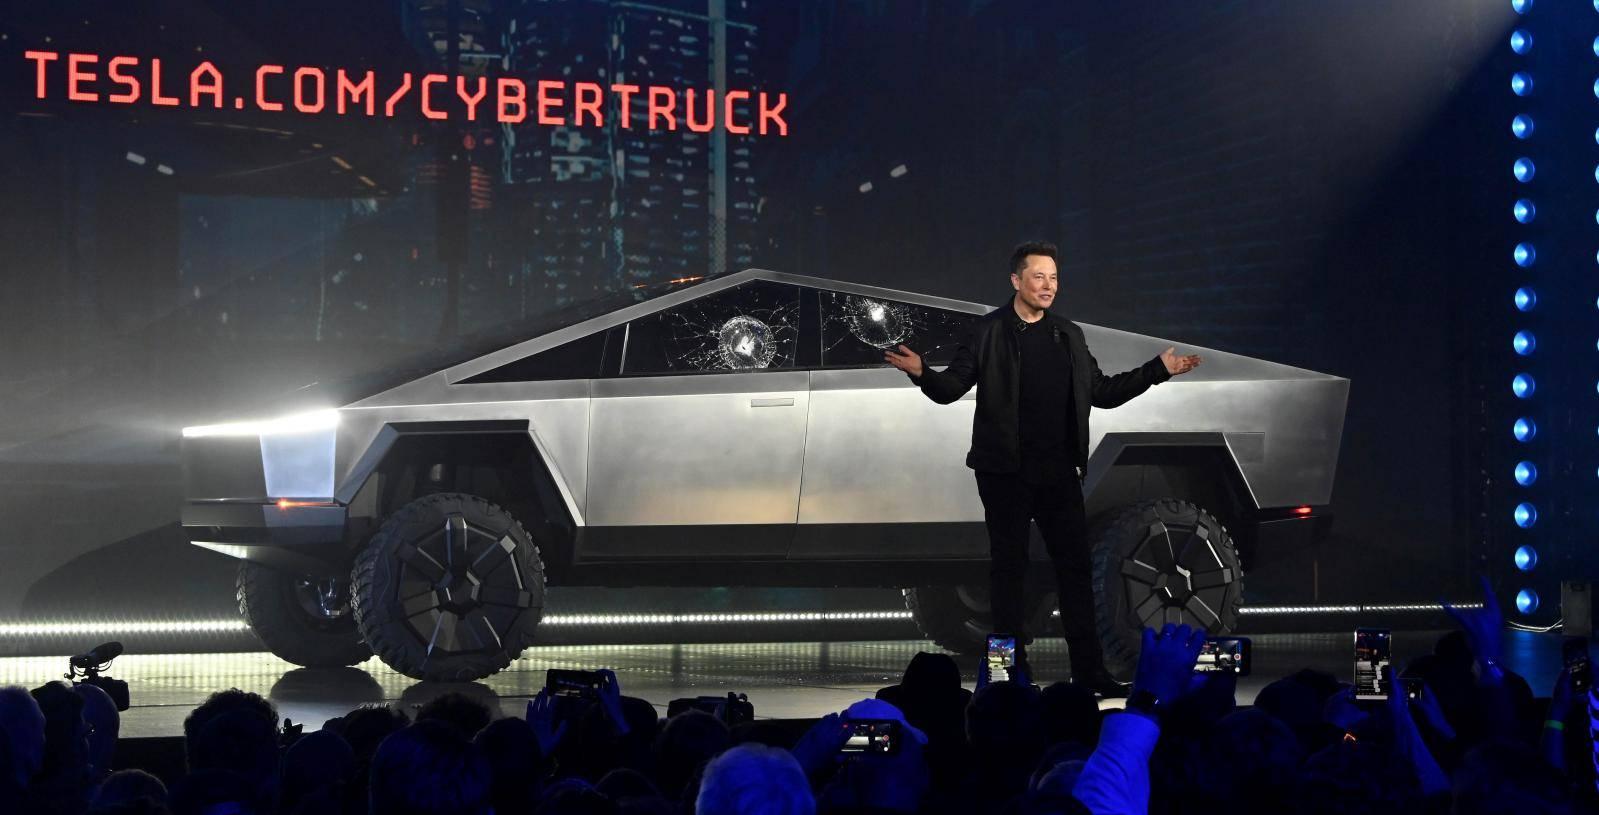 News: Tesla Cybertruck